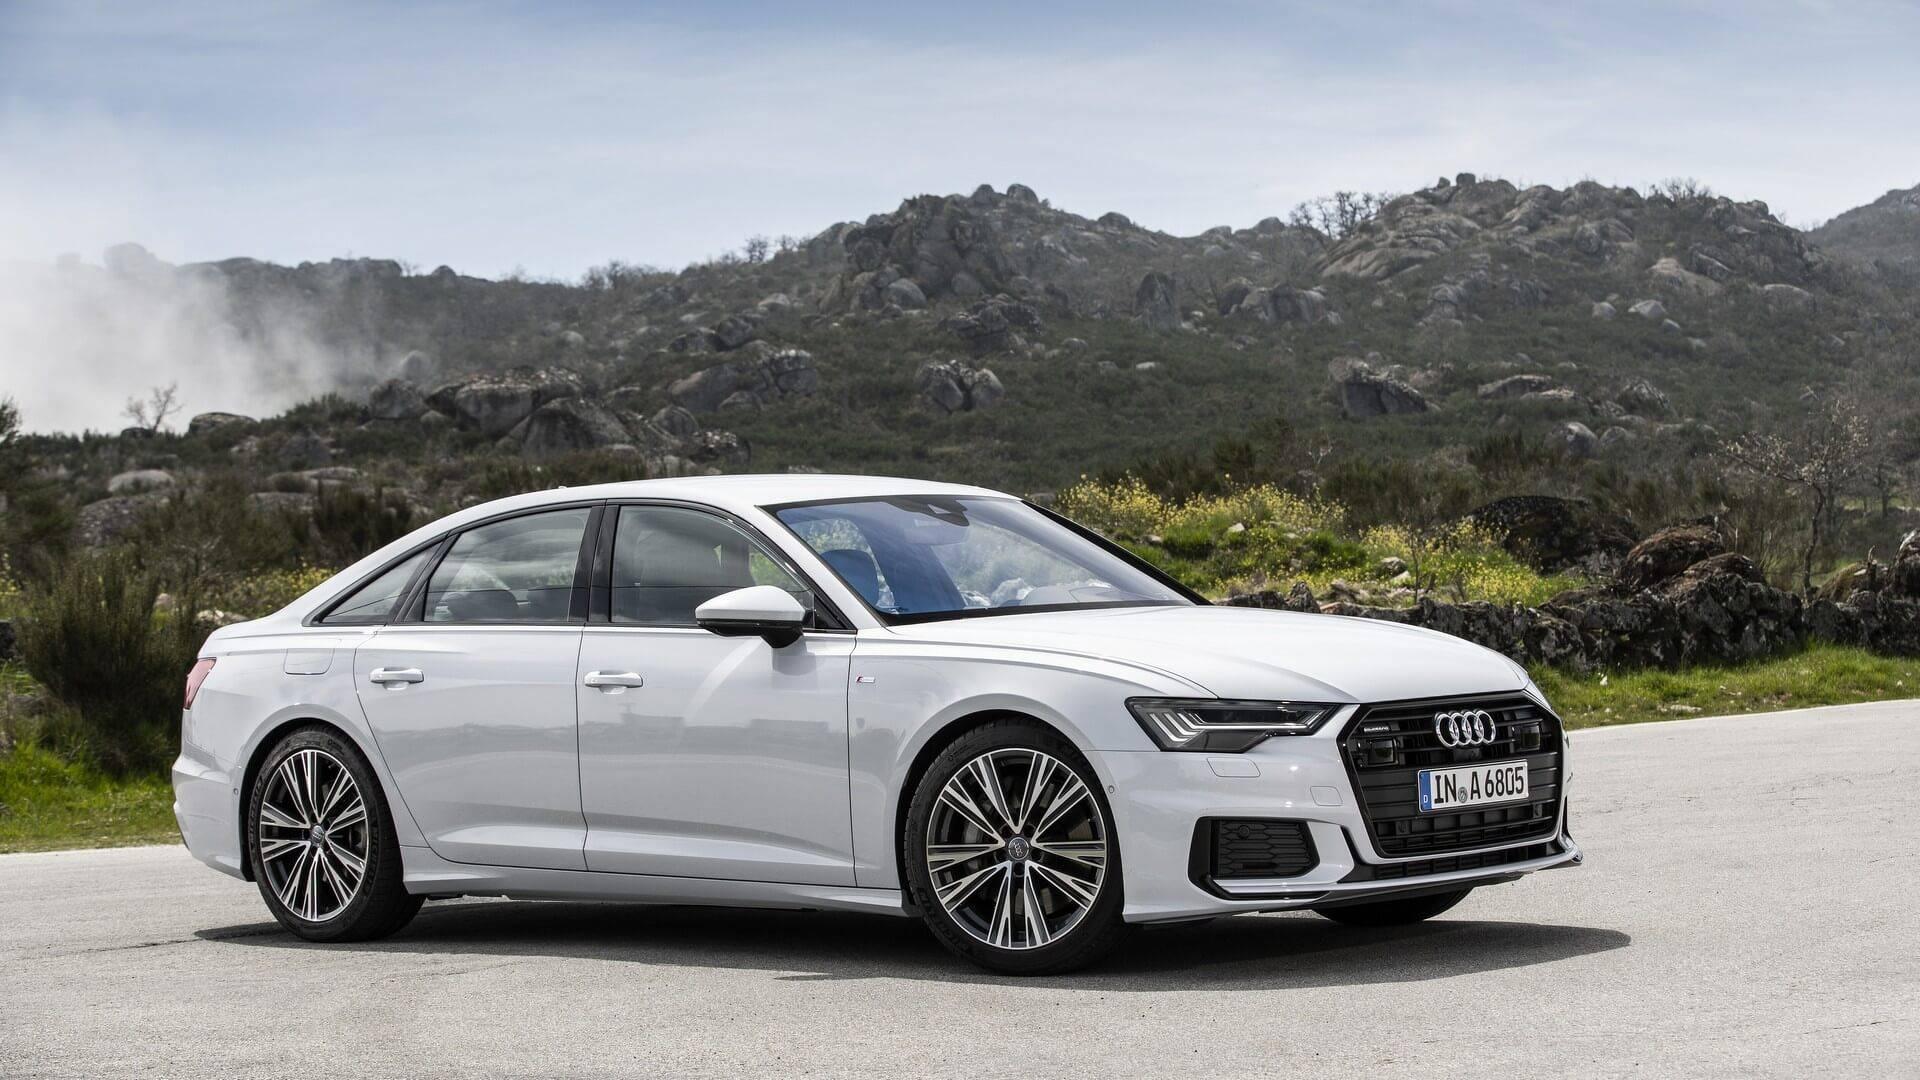 Maple Hill Audi >> 2019 Audi A6 Avalon Green - Audi Cars Review Release Raiacars.com